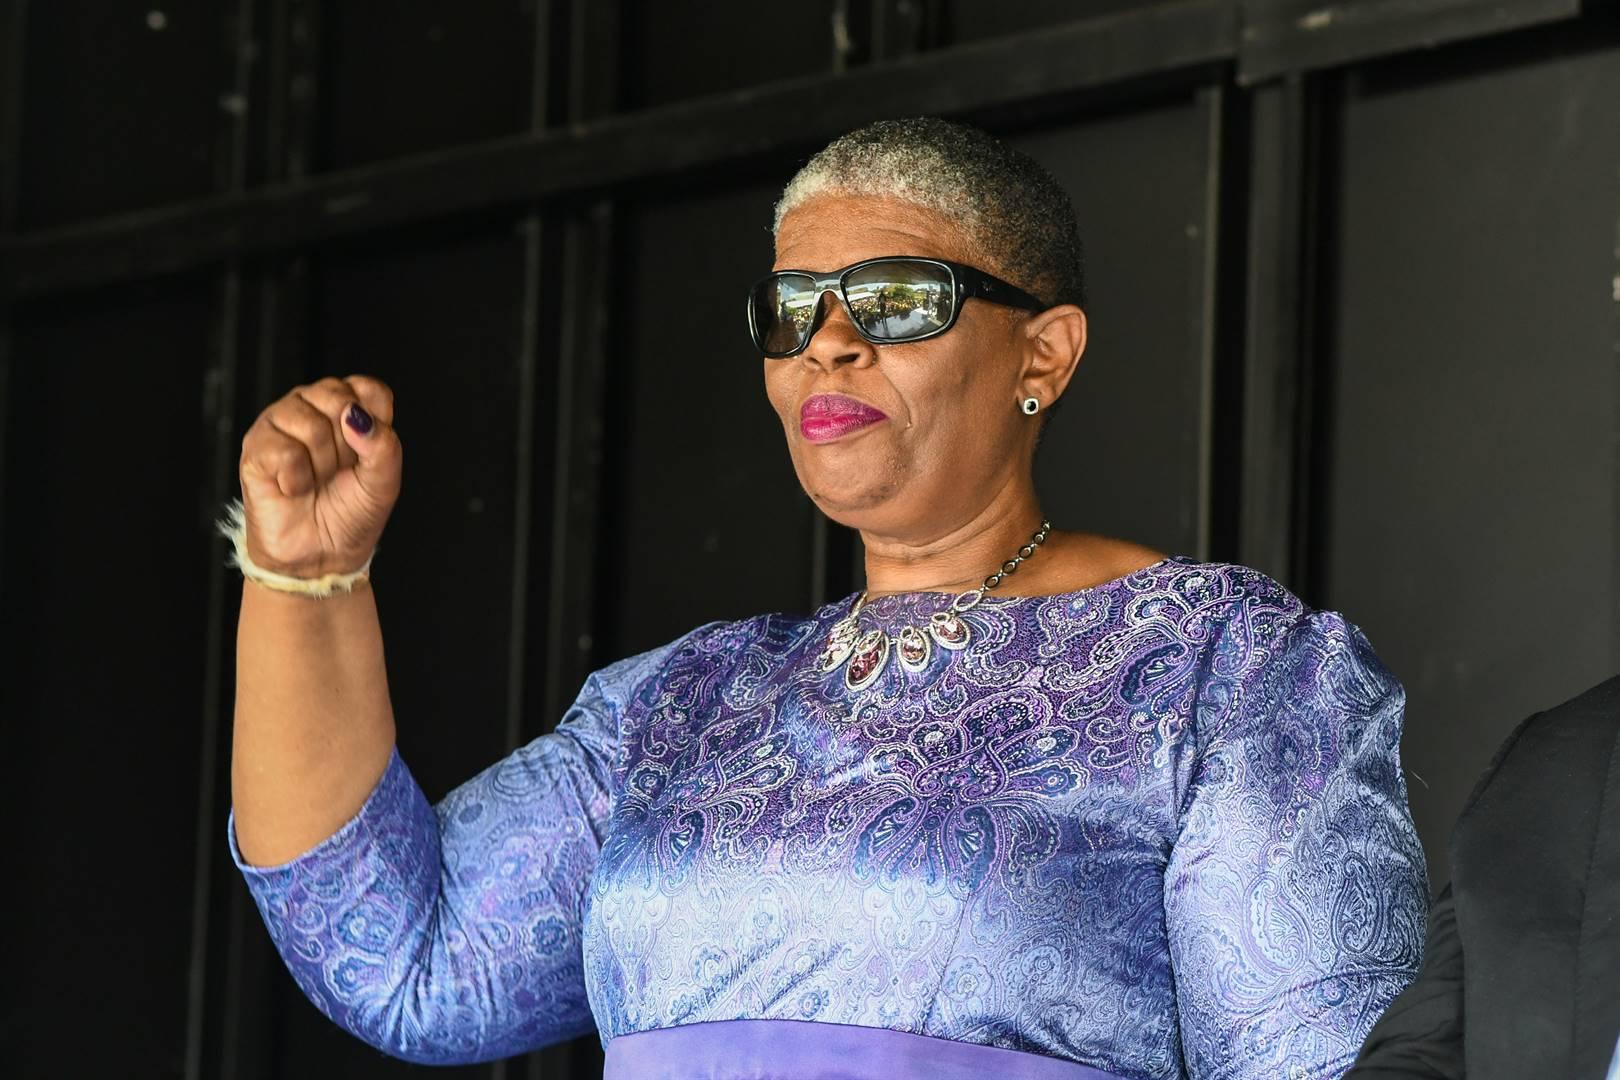 Former eThekwini mayor Zandile Gumede. Picture: Gallo Images